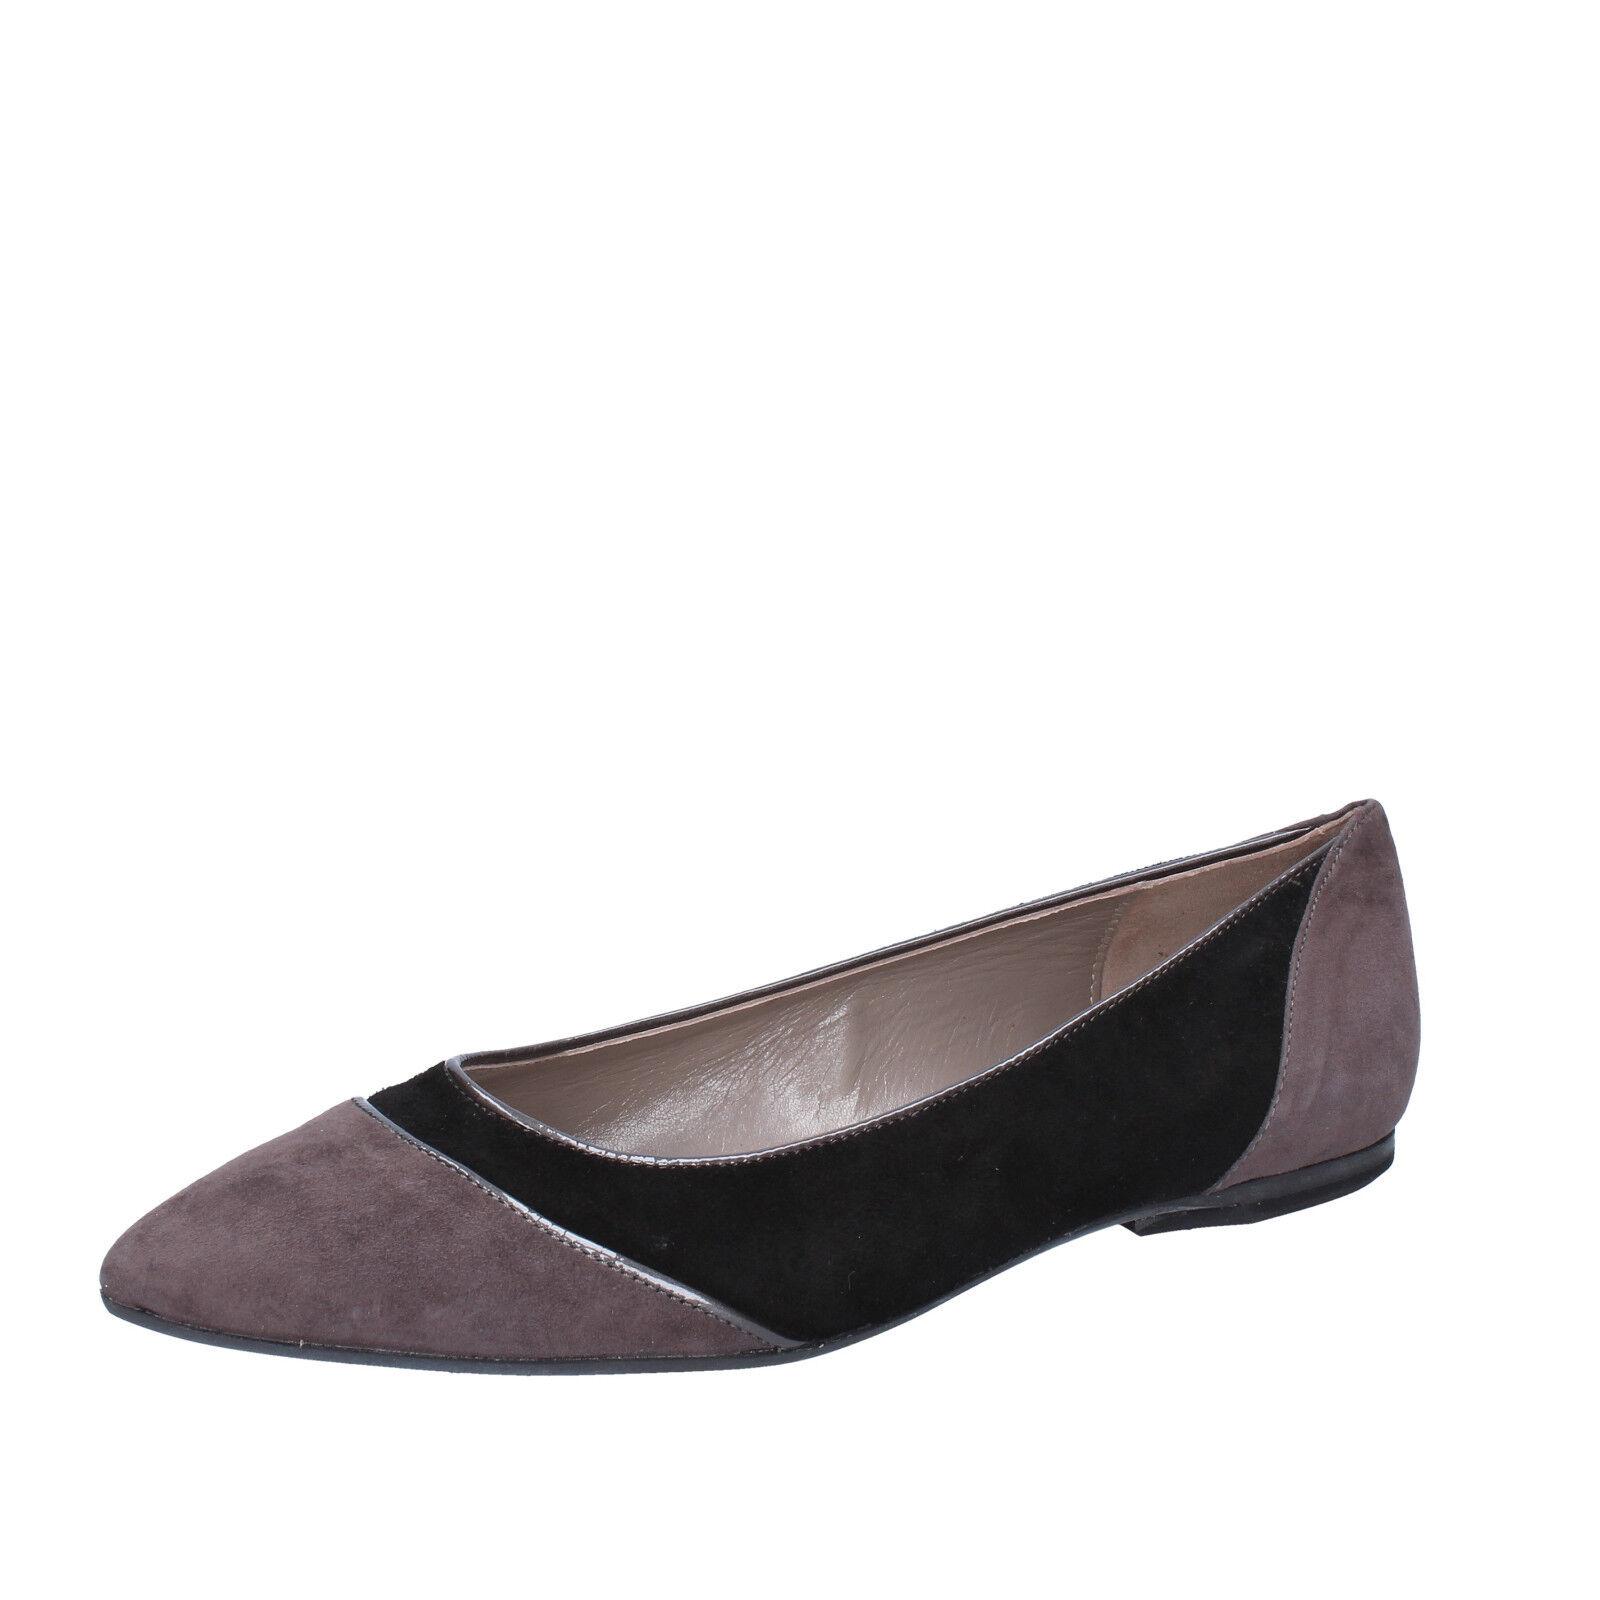 Damens's schuhe EDDY DANIELE 7 (EU 37) flats gray schwarz suede AV432